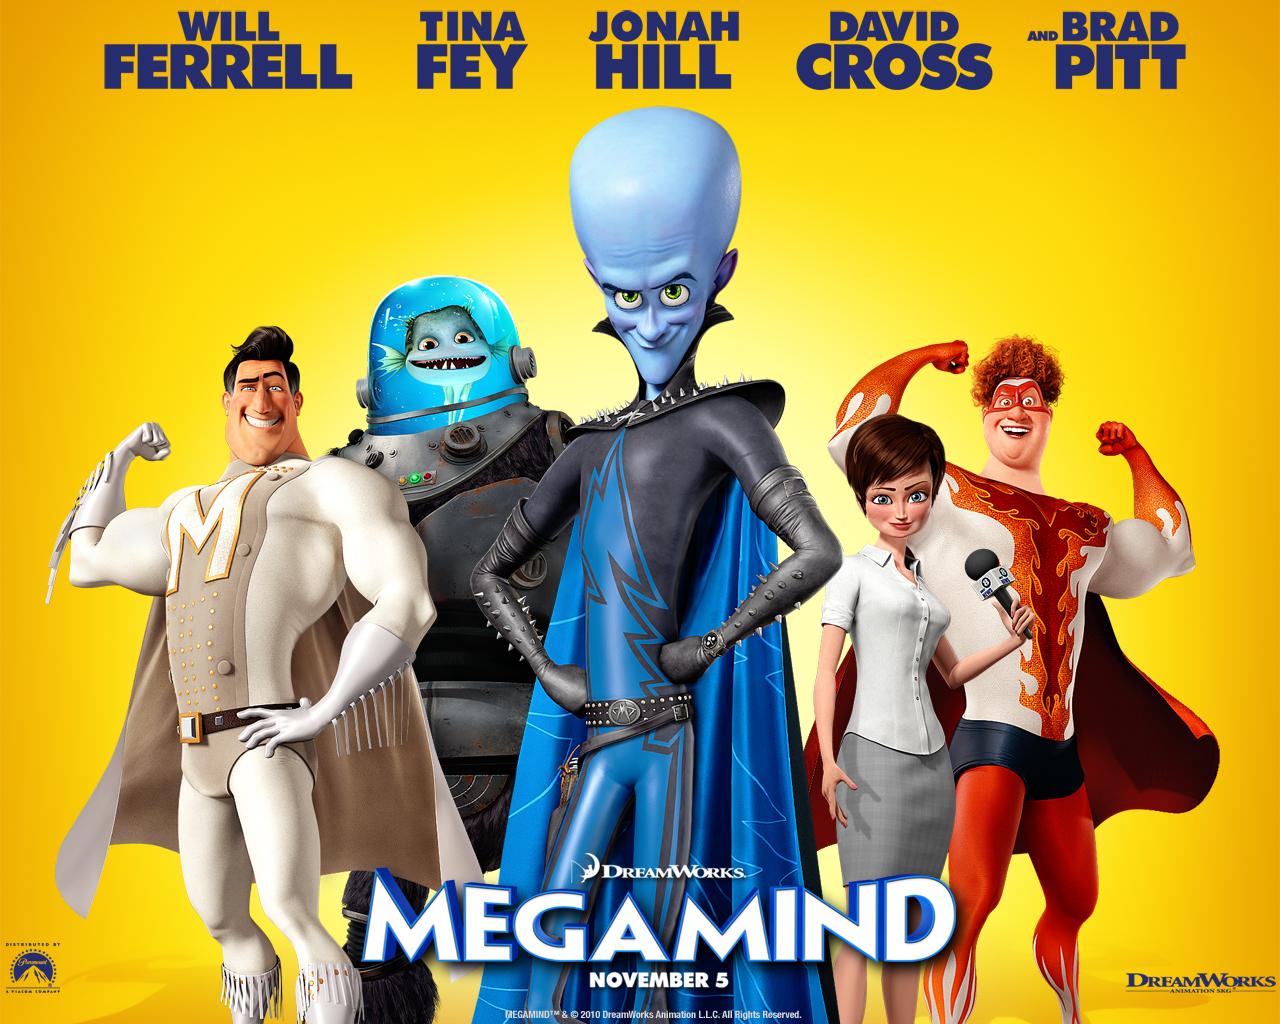 http://4.bp.blogspot.com/-3p1JOfxmClE/Ta-hiIyHMyI/AAAAAAAAARE/AIDzDg0nWtg/s1600/megamind+poster.jpg